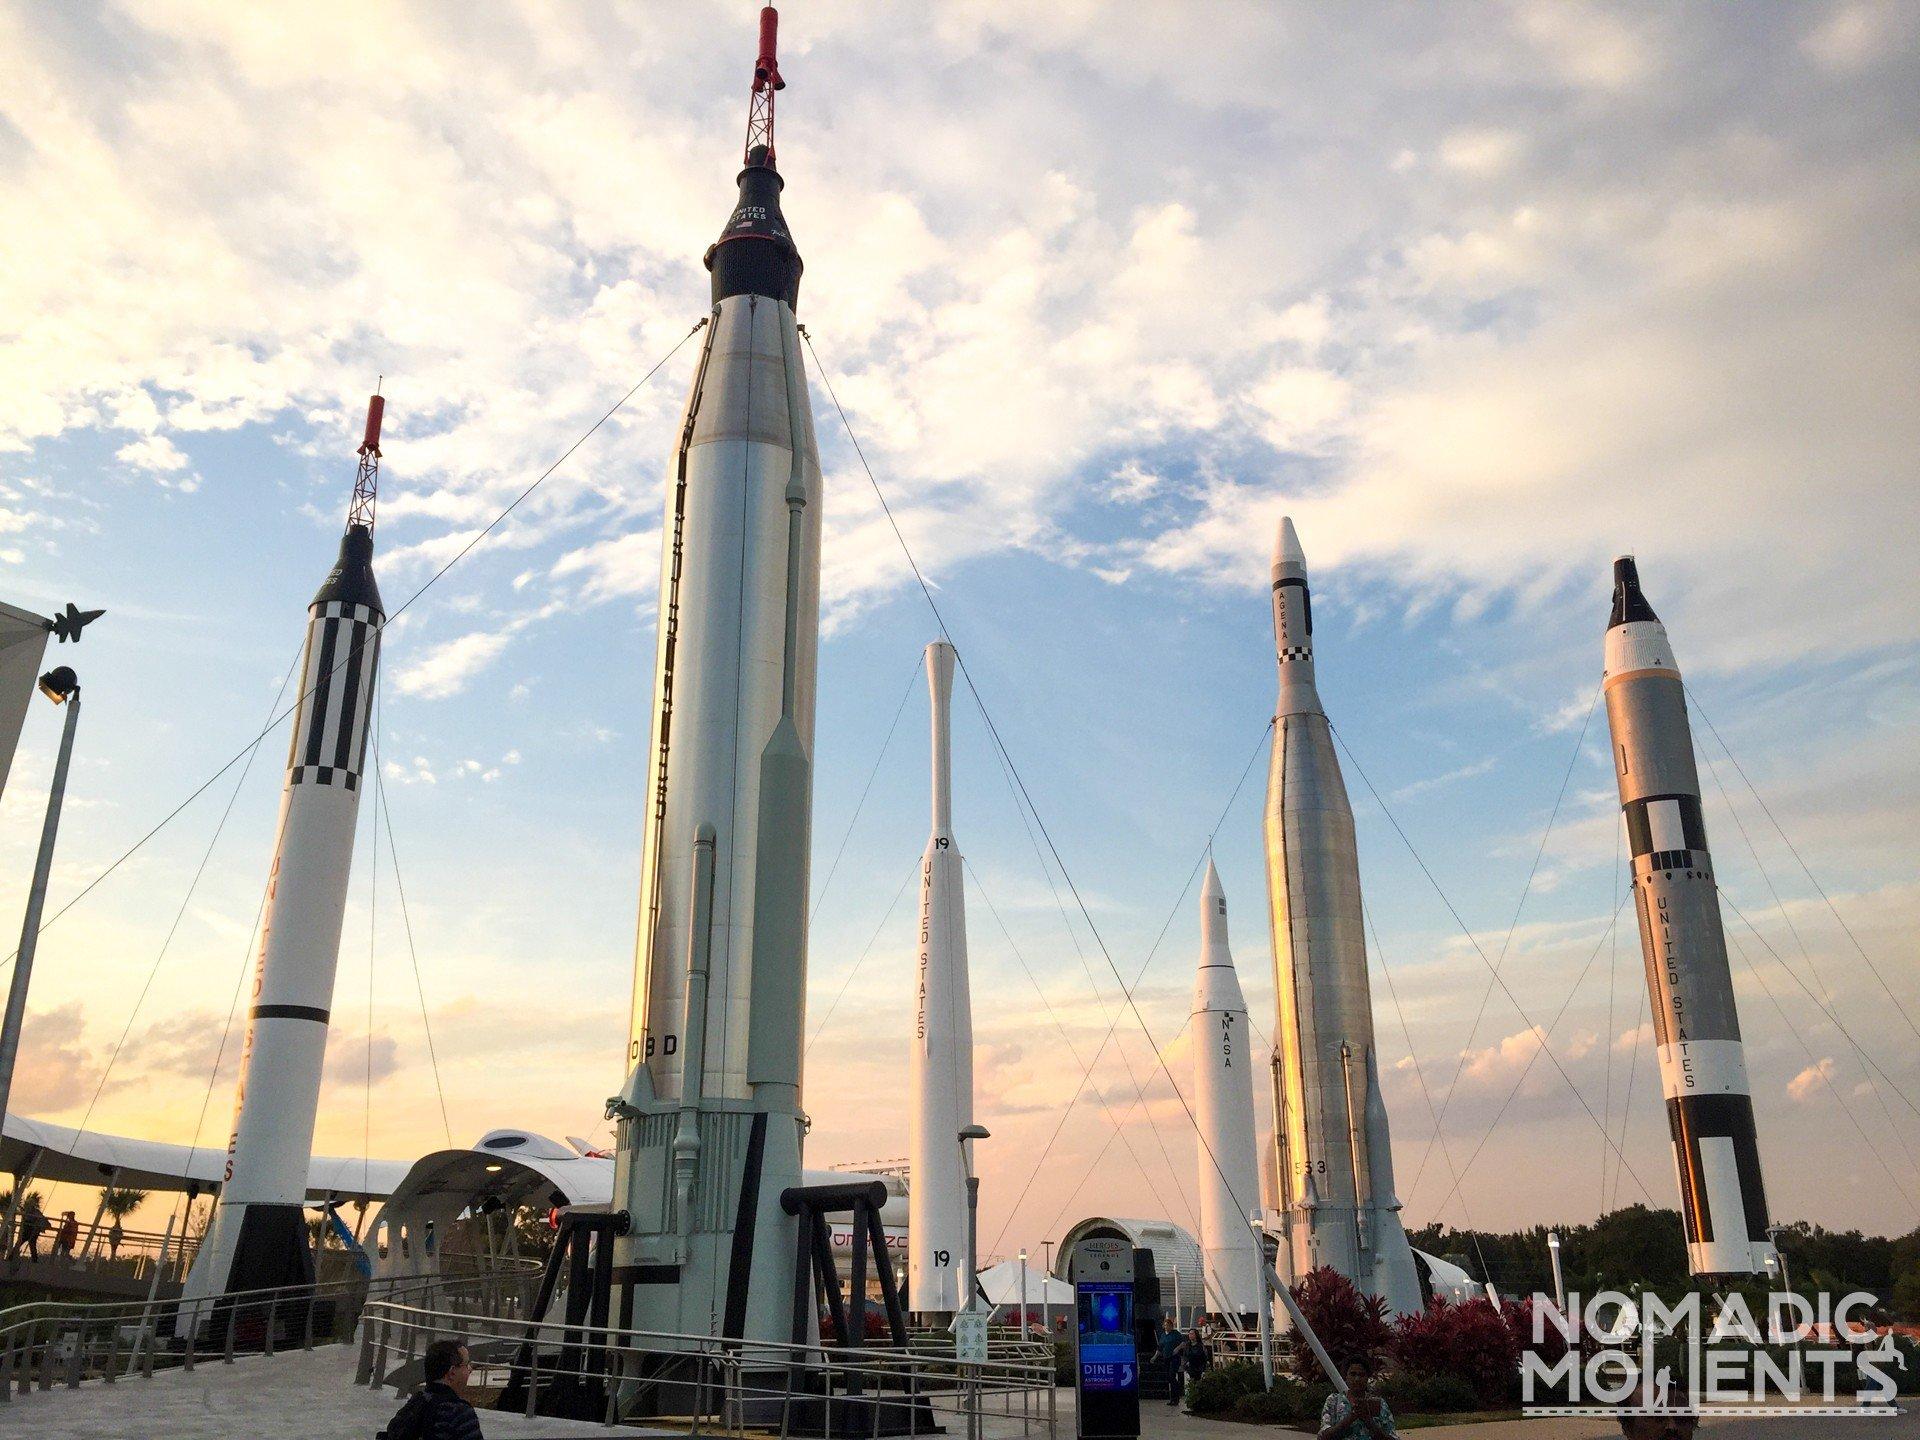 The Kennedy Space Center Rocket Garden